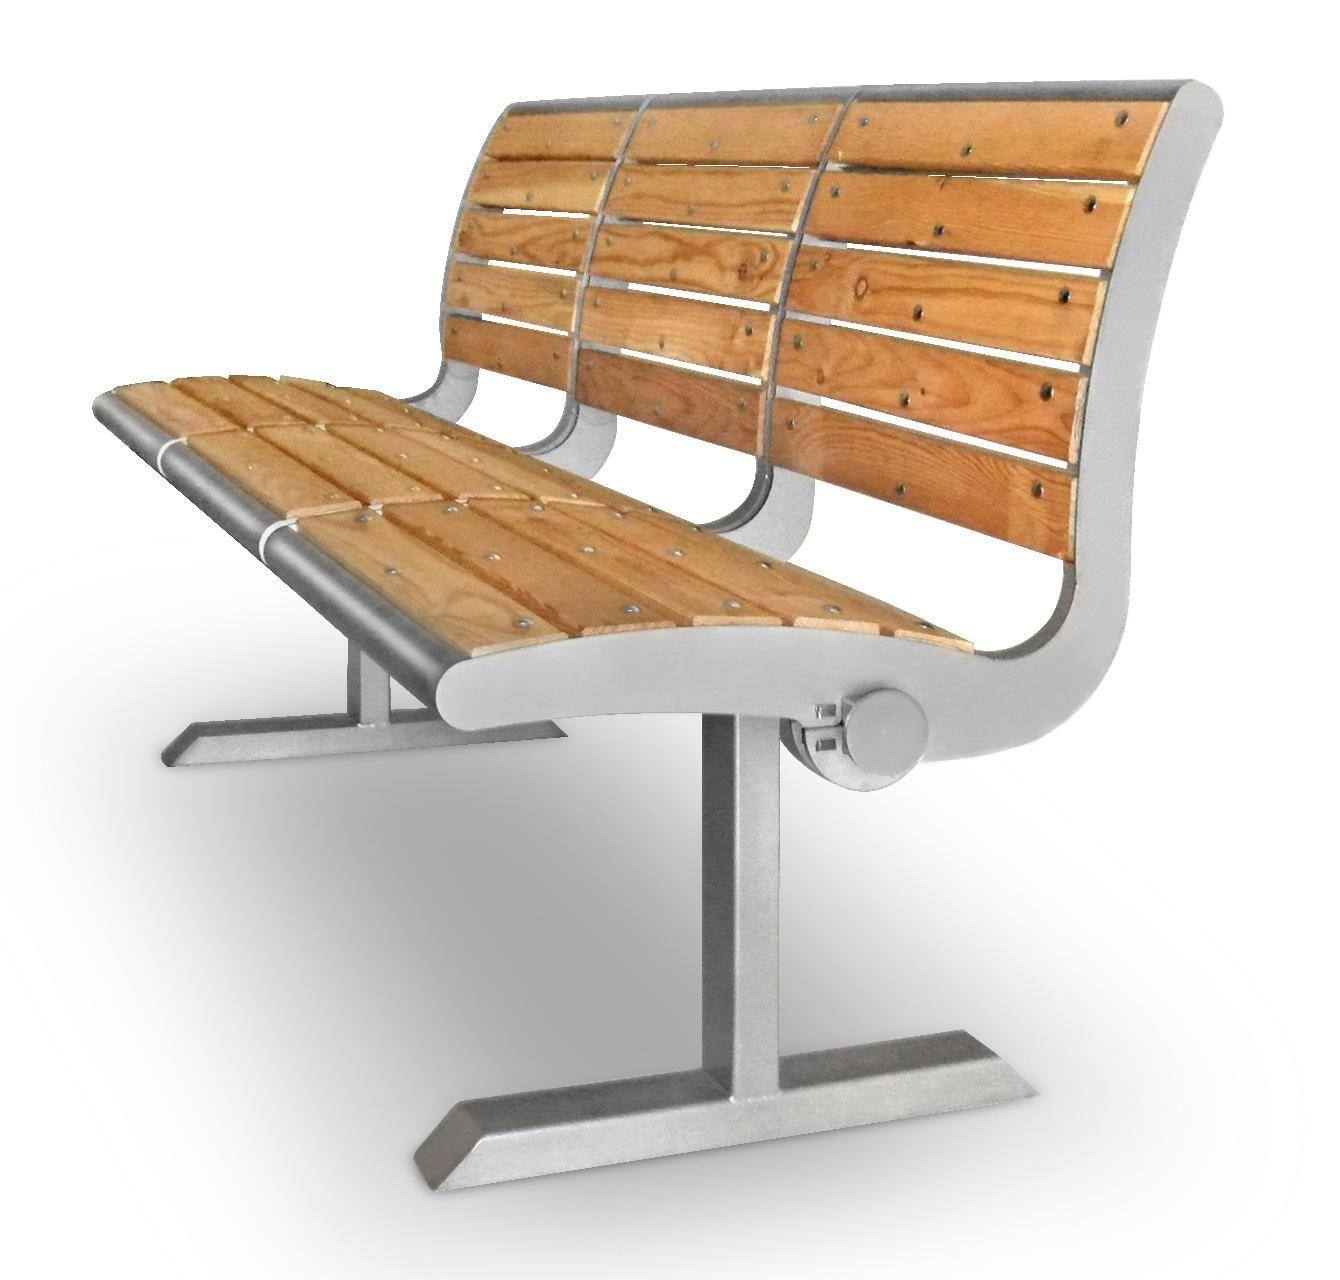 Sitzbänke aus Edelstahl